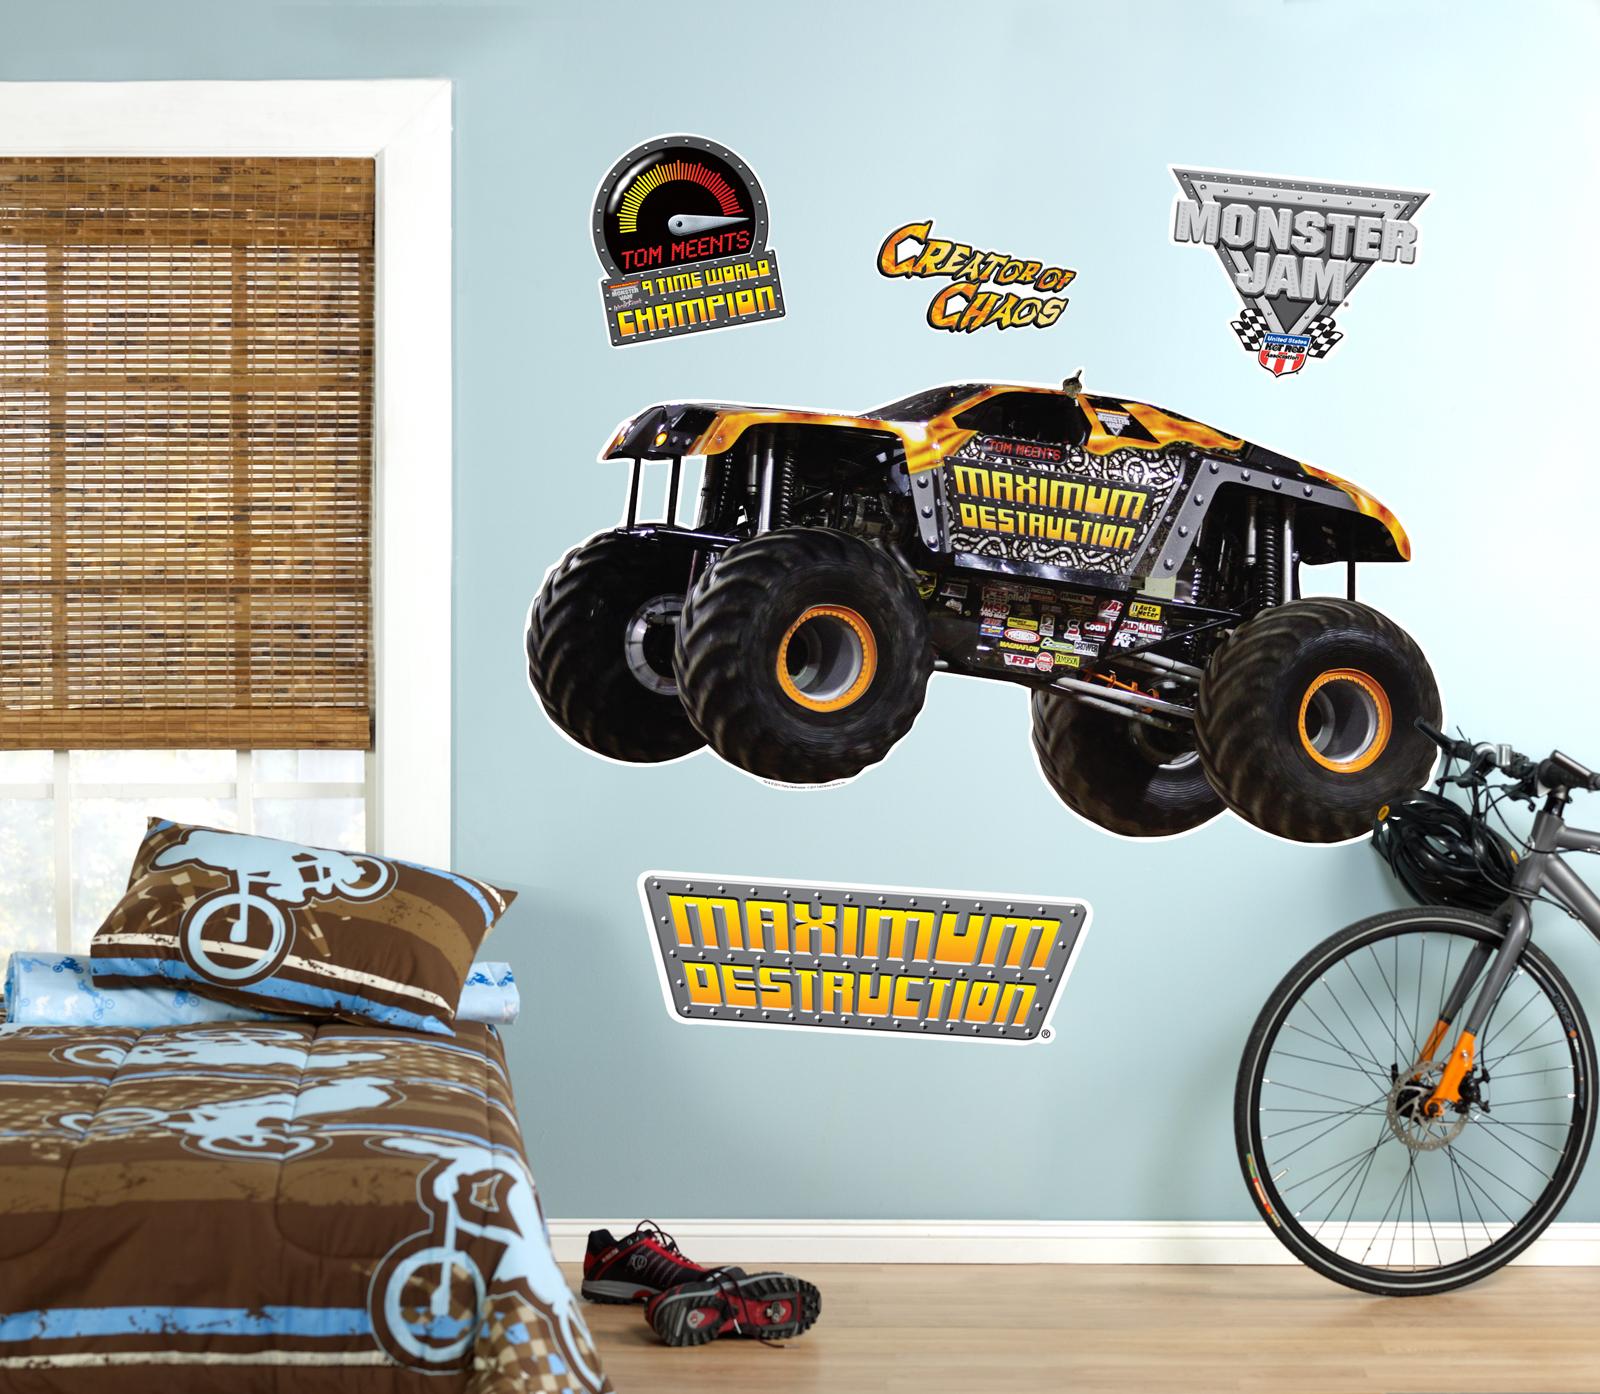 Charming Monster Truck Wall Stickers Part - 2: Default Image - Monster Jam Maximum Destruction Giant Wall Decal